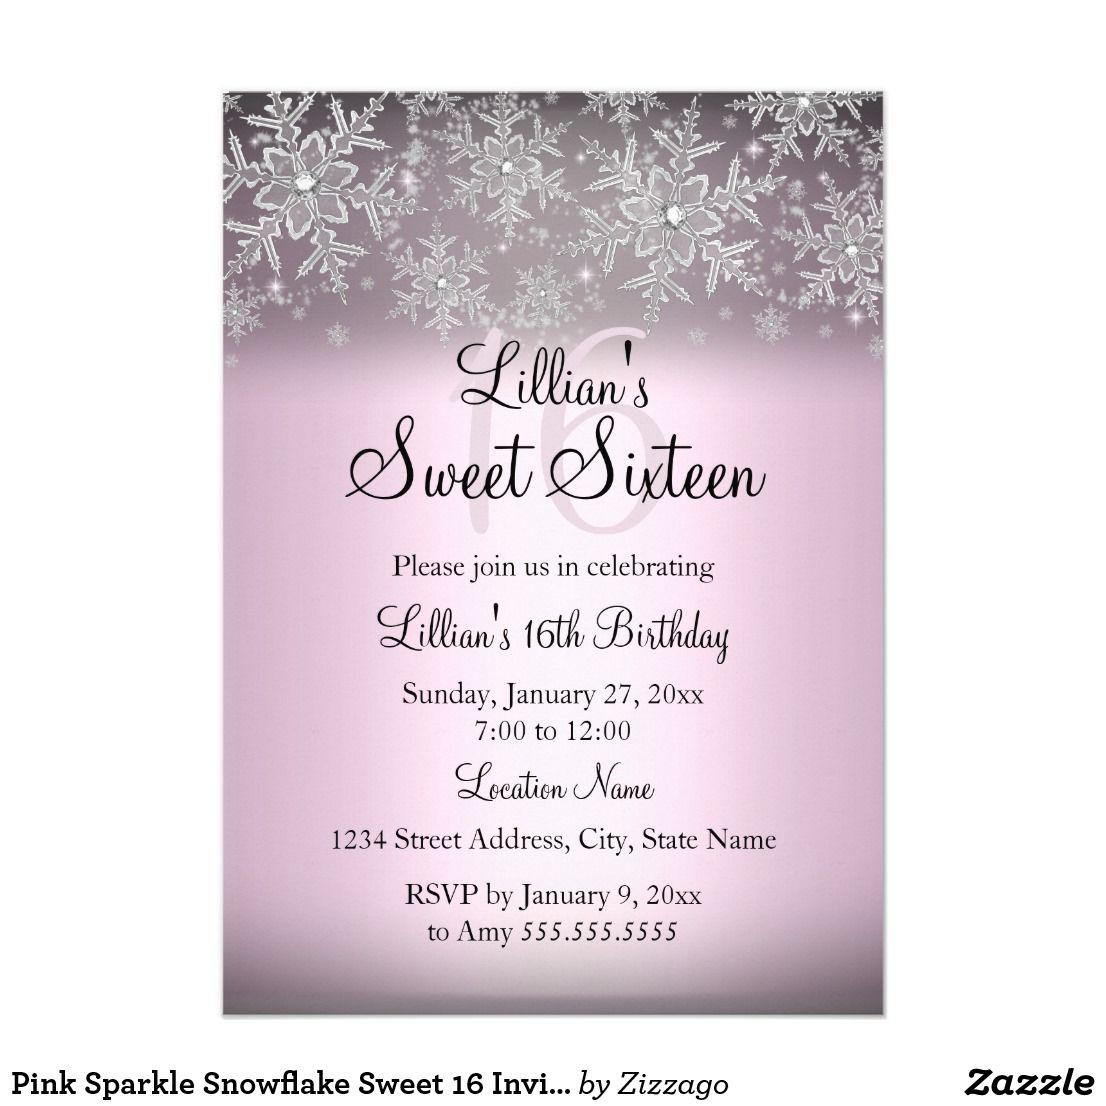 Pink Sparkle Snowflake Sweet 16 Invitation Pink Sweet 16 Birthday ...